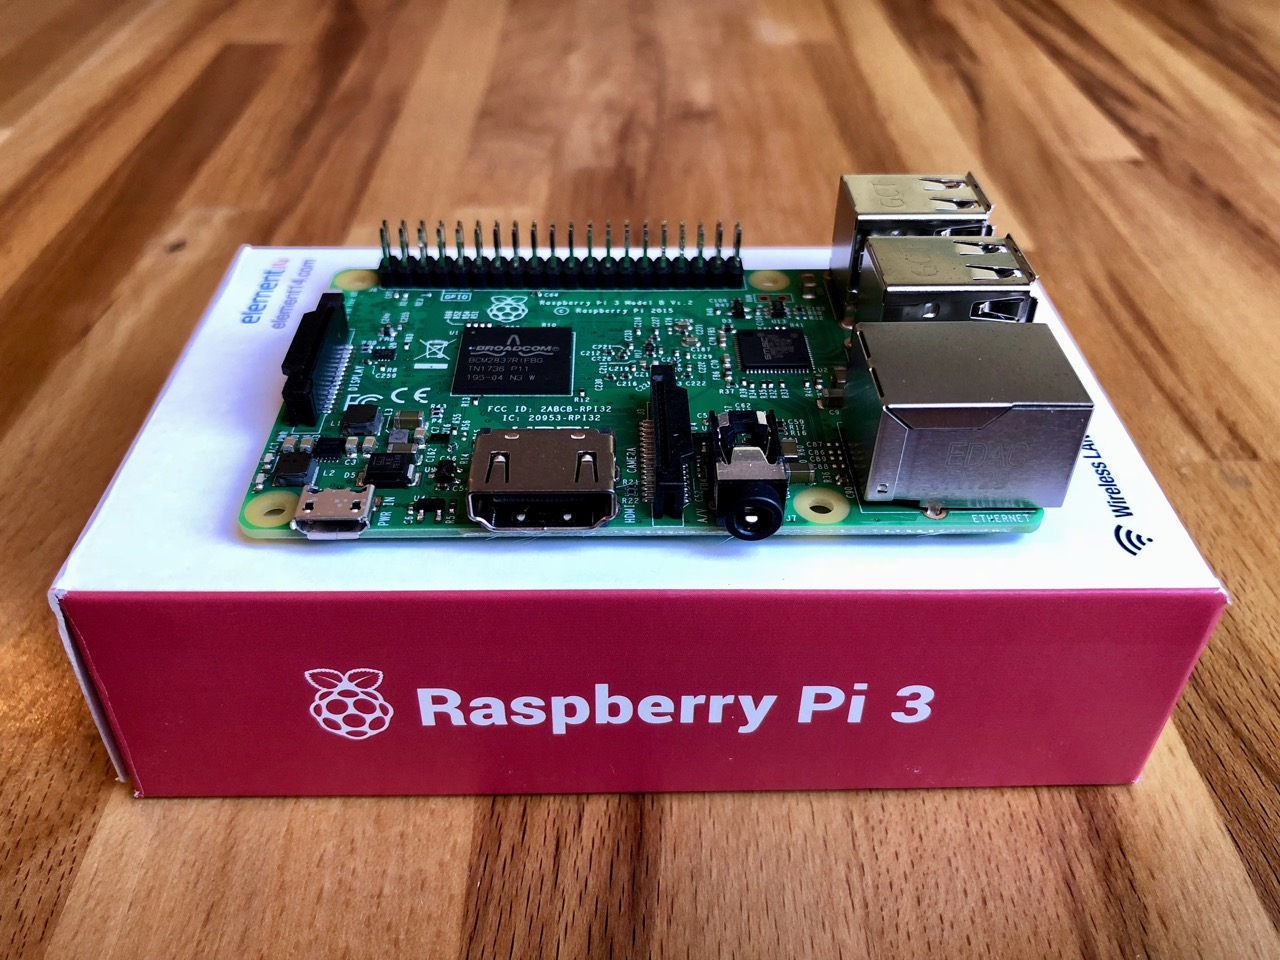 Raspberry Pi 3 Model B: Ansicht auf dem Originalkarton. (Bild: André Eymann)